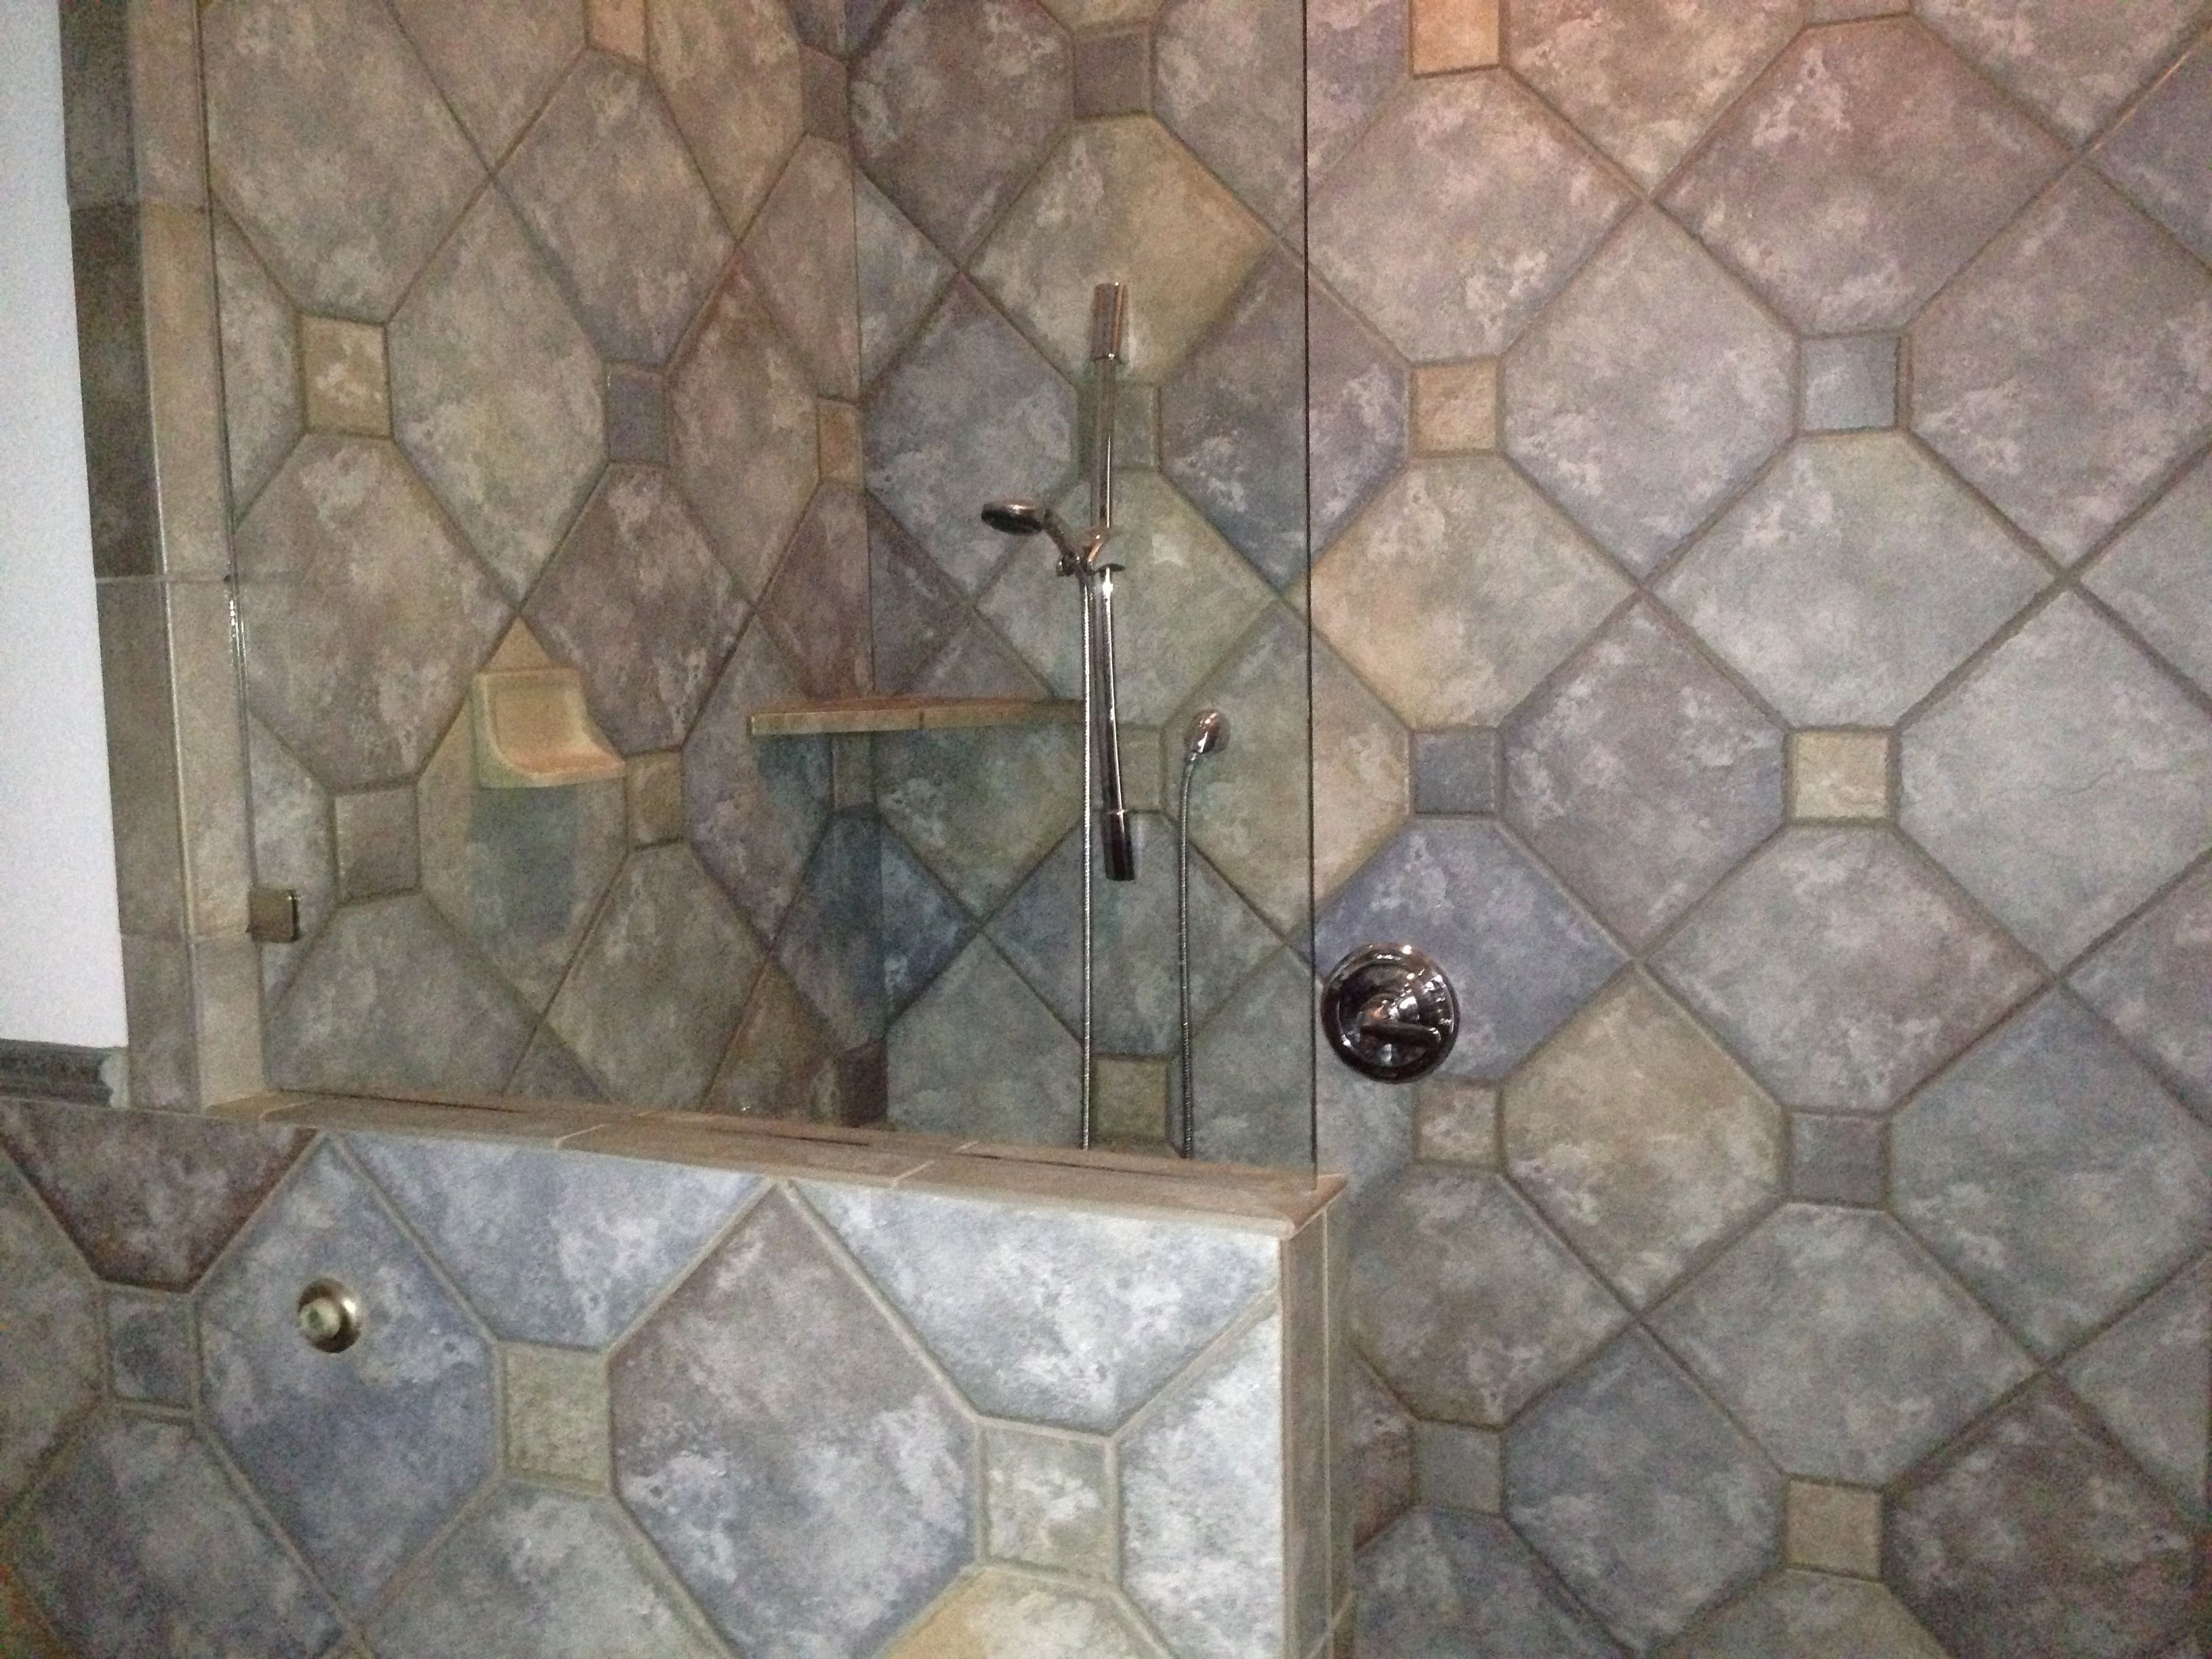 Partial Wall For Walk In Shower Home Decor Pinterest A Walk - Walk in shower designs no door